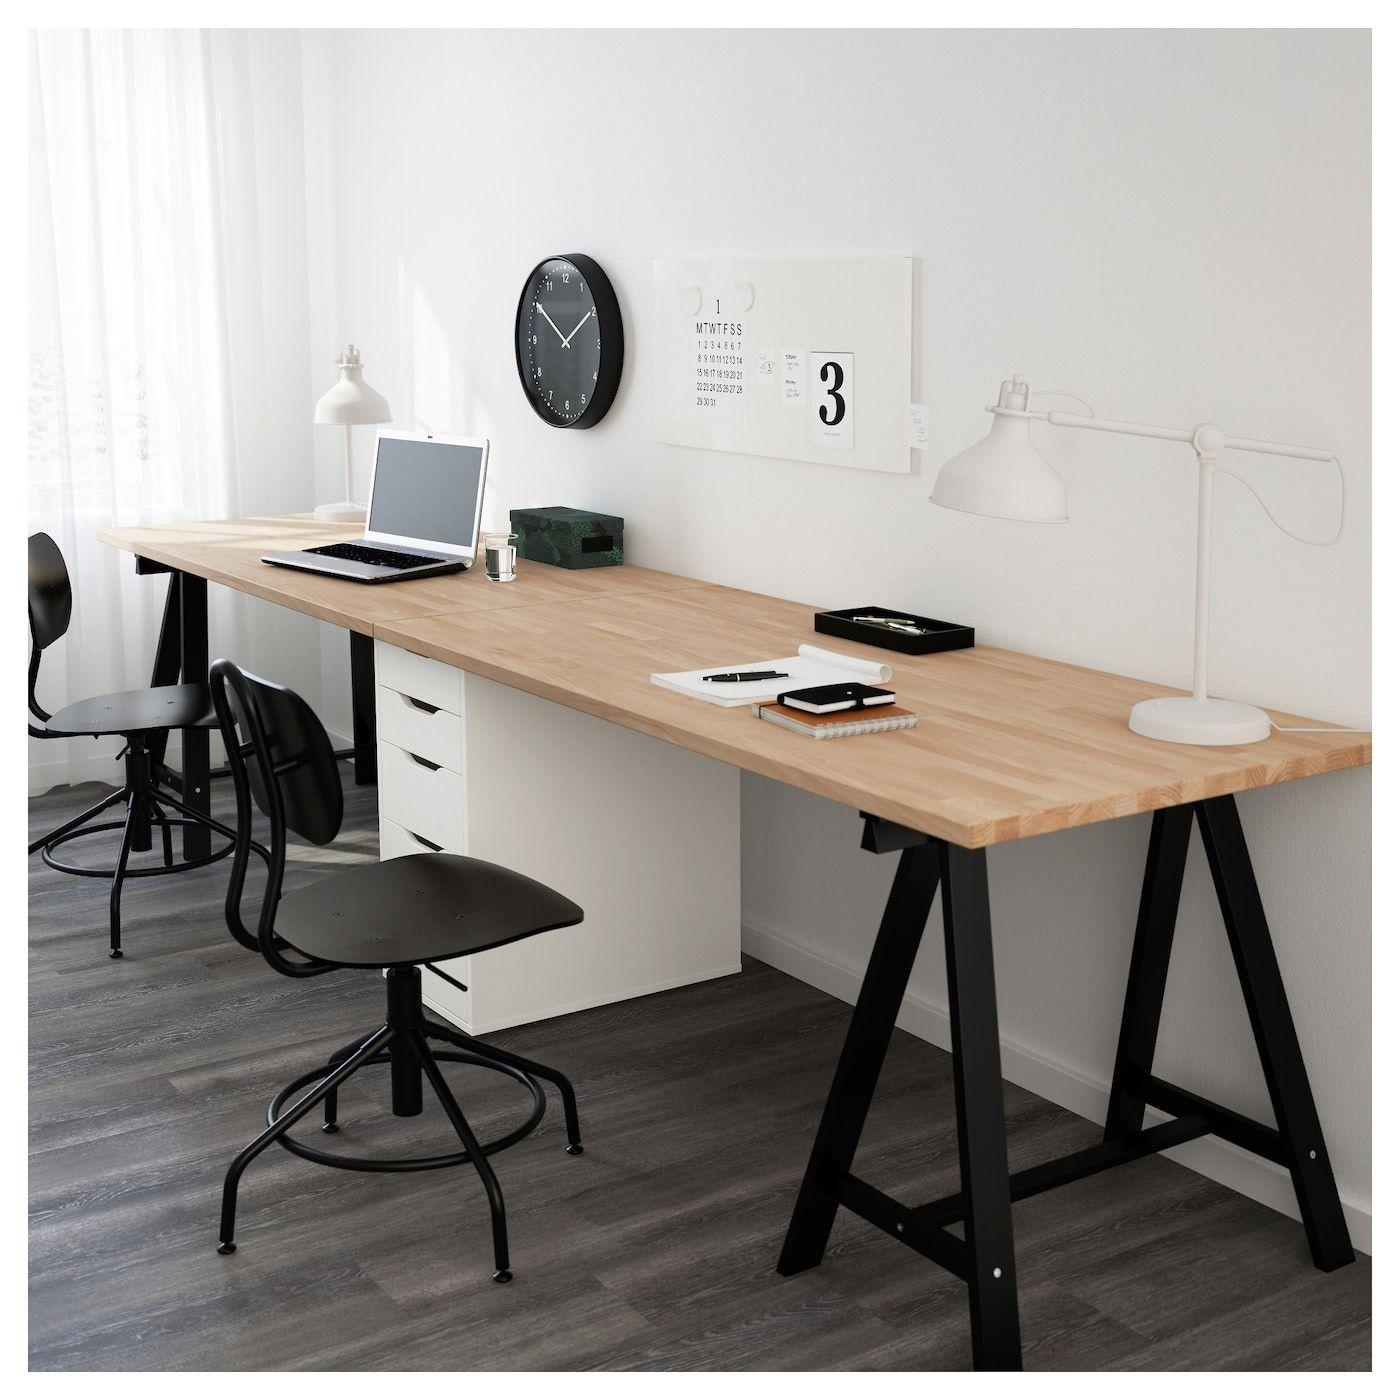 Gerton Table Beech Black White 122x29 1 2 310x75 Cm Werkkamer Thuis Werkkamer Bureau Kantoor Hoekje